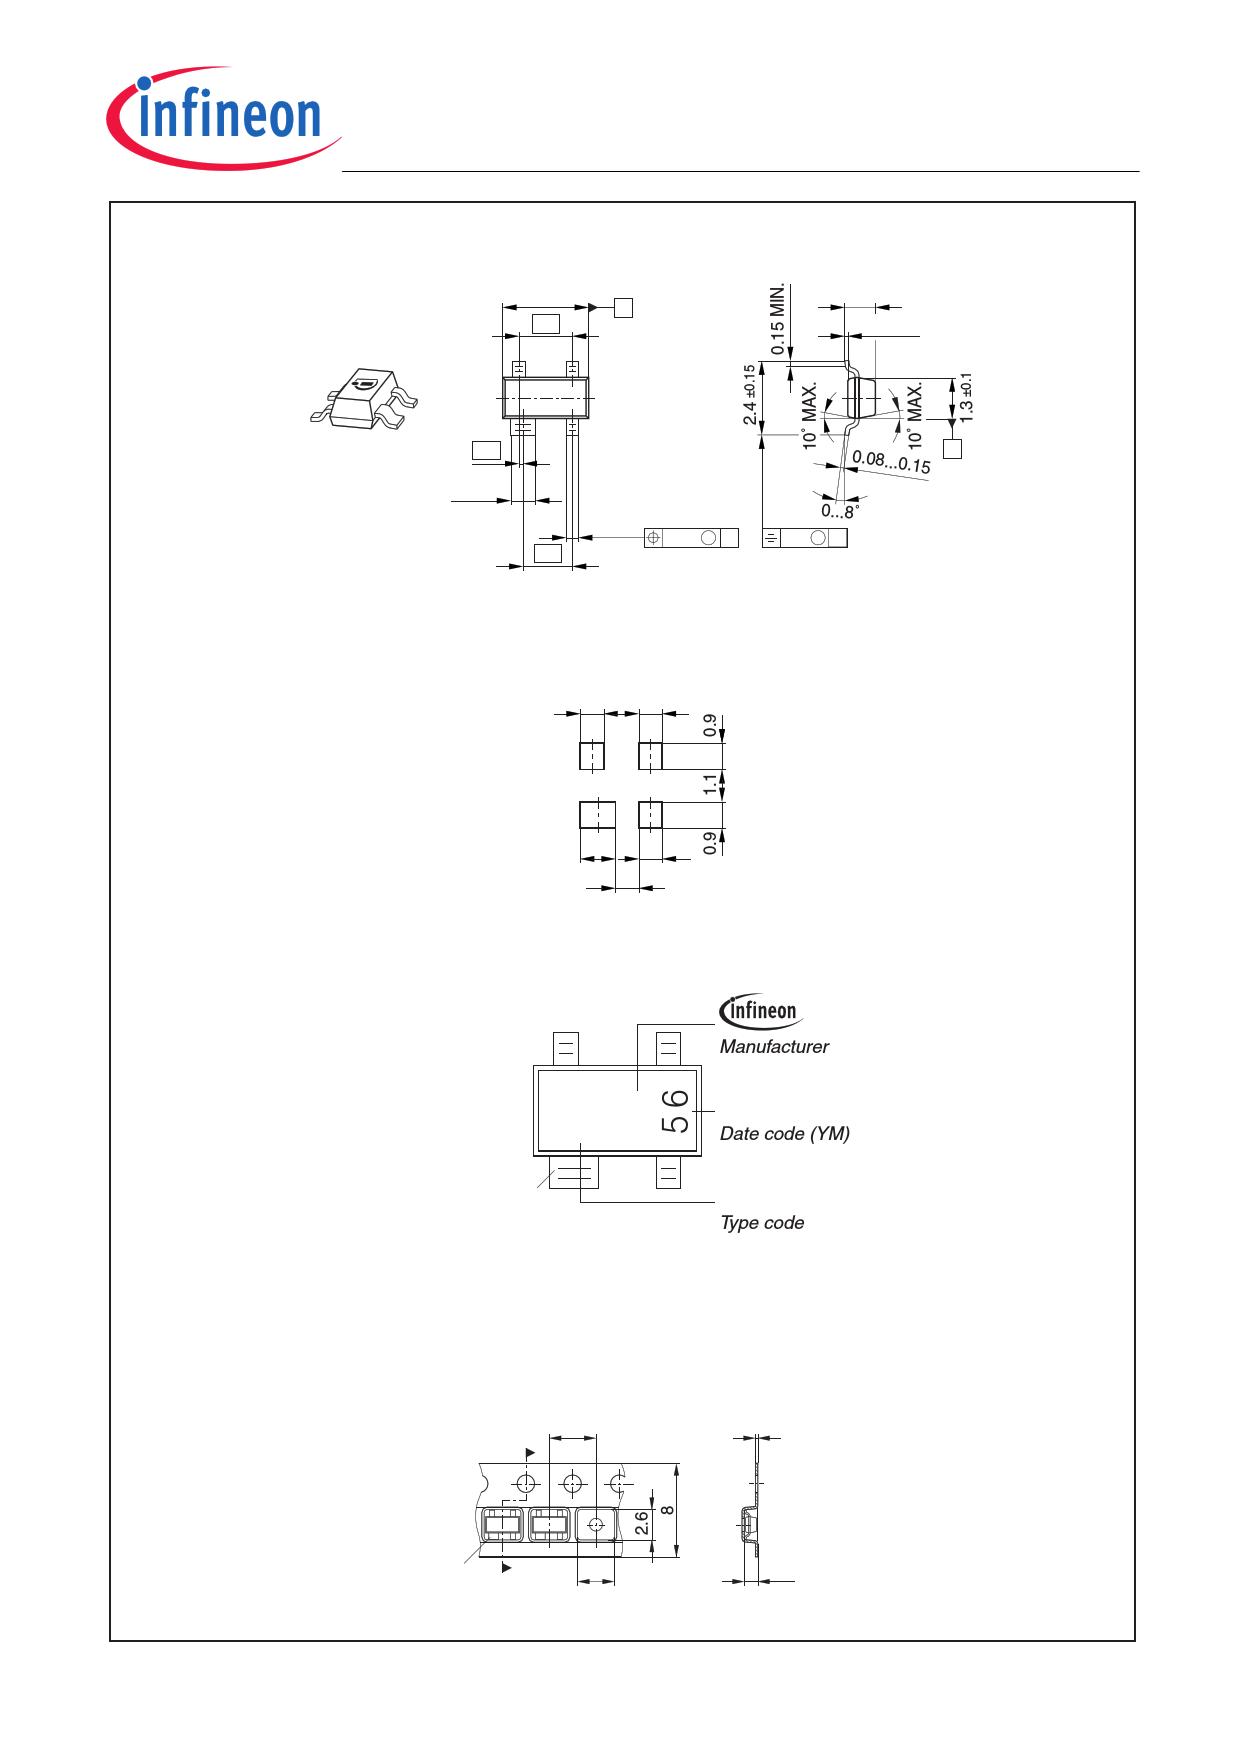 BCV61 電子部品, 半導体